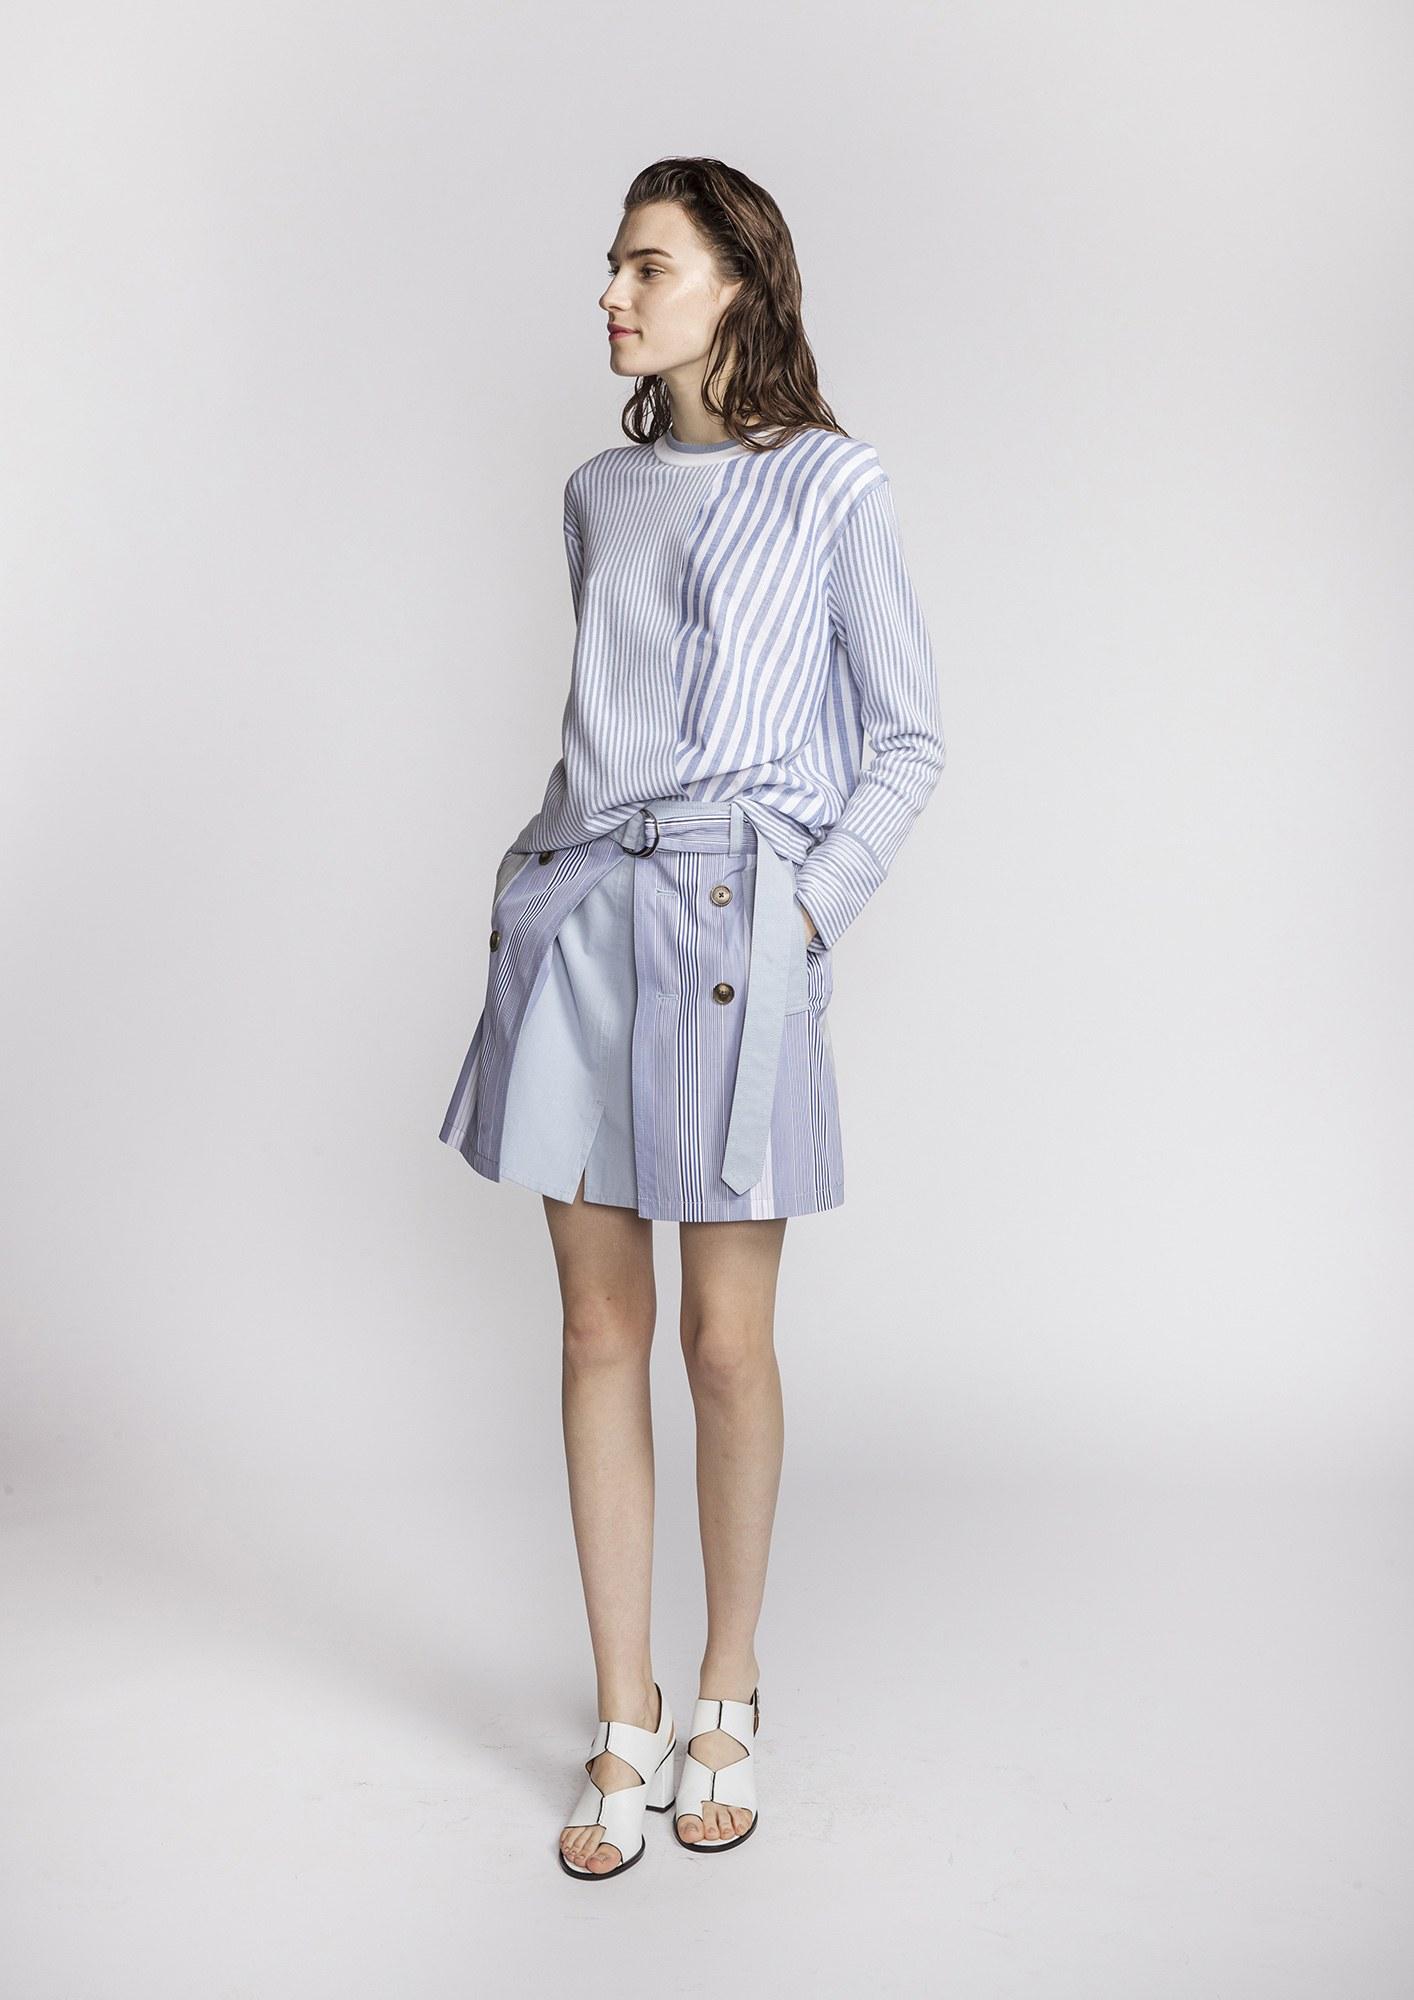 Blue/White Striped Shirt 2017